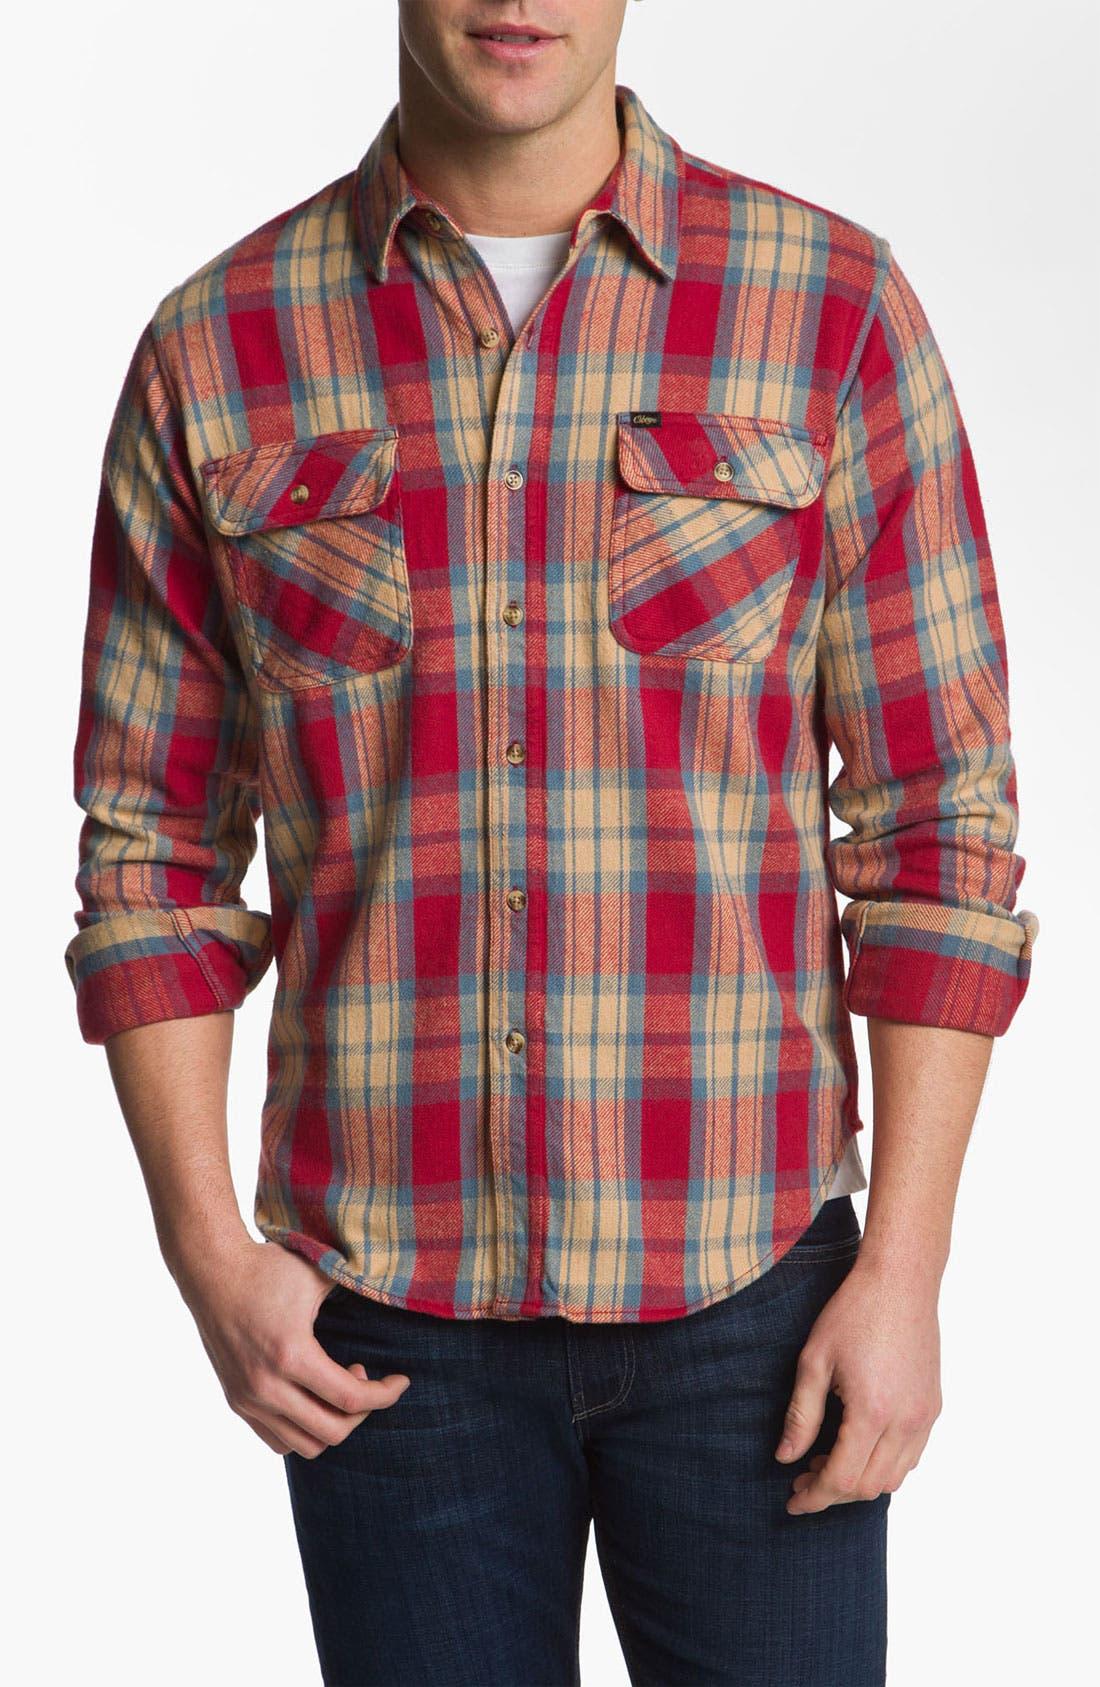 Main Image - Obey 'Merrick' Woven Plaid Shirt